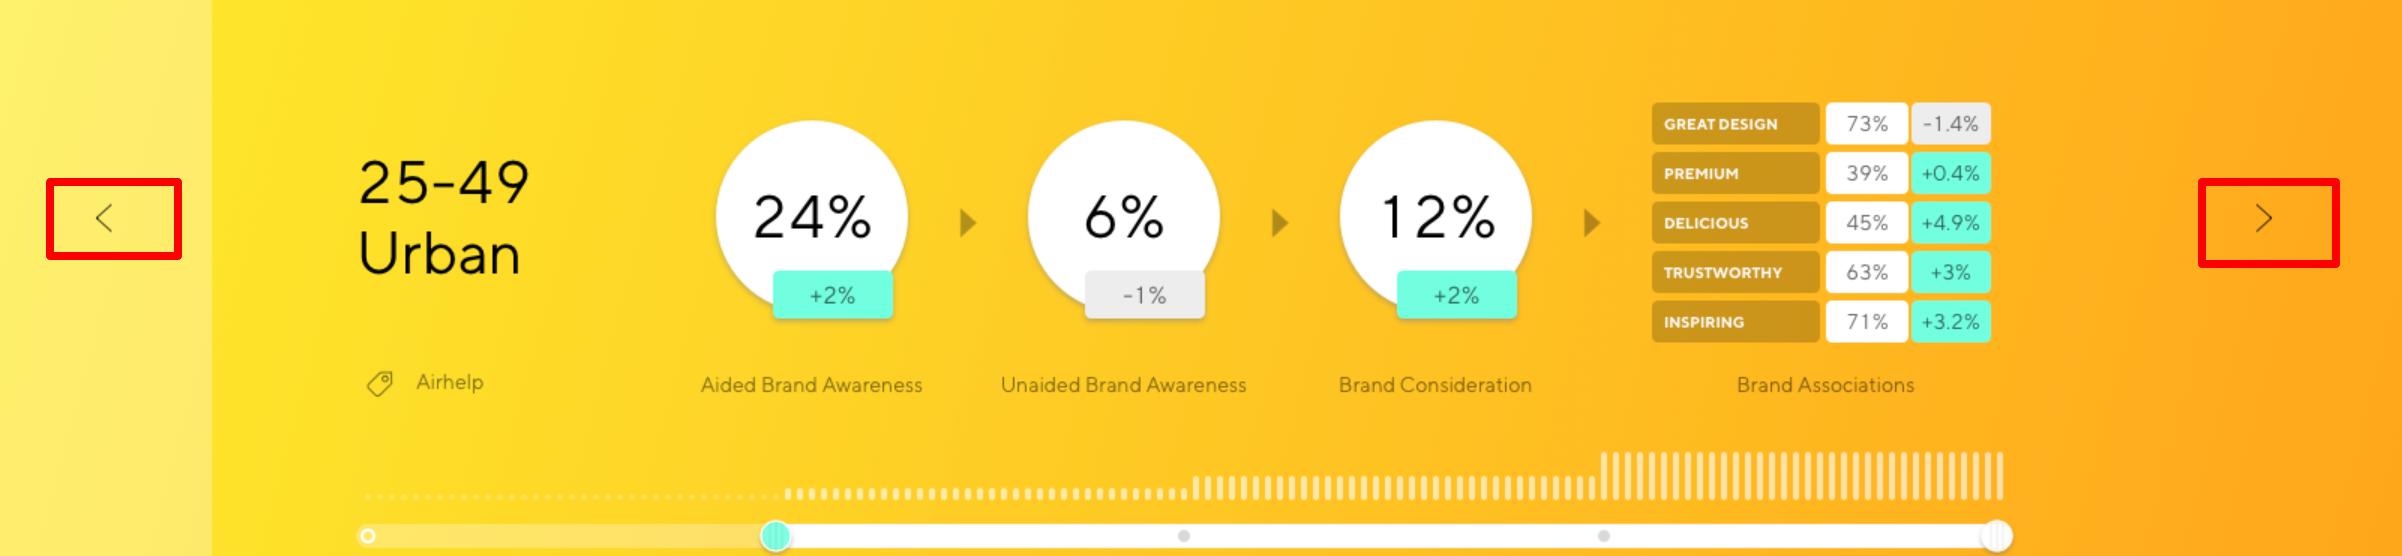 Latana Brand Analytics Platform Audience Toggle